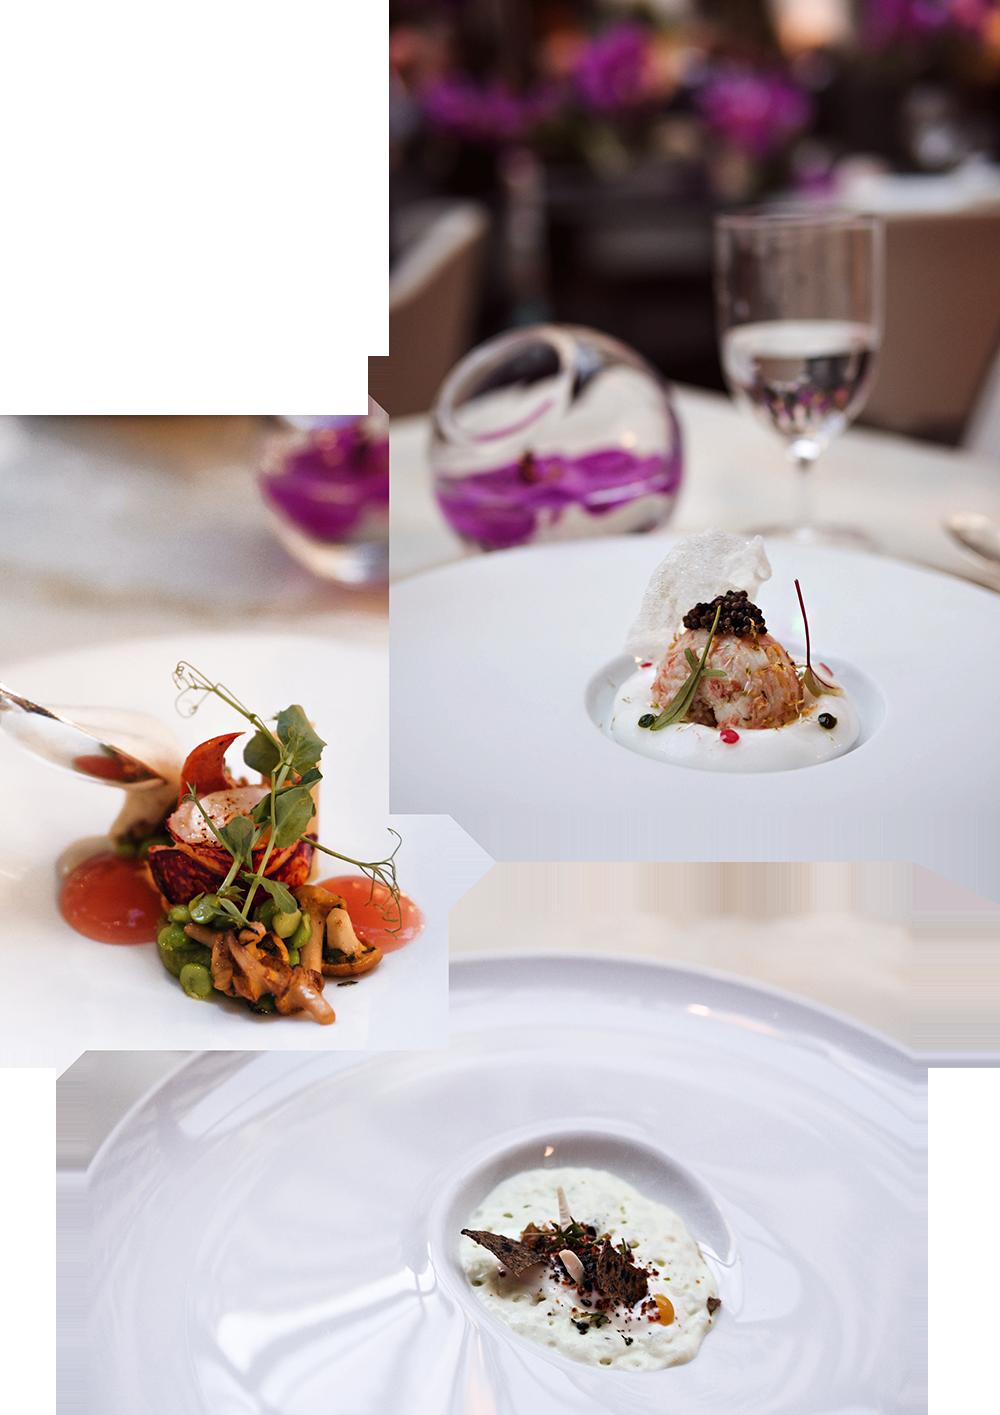 luxury-hotel-four-seasons-paris-lorangerie-restaurant-food